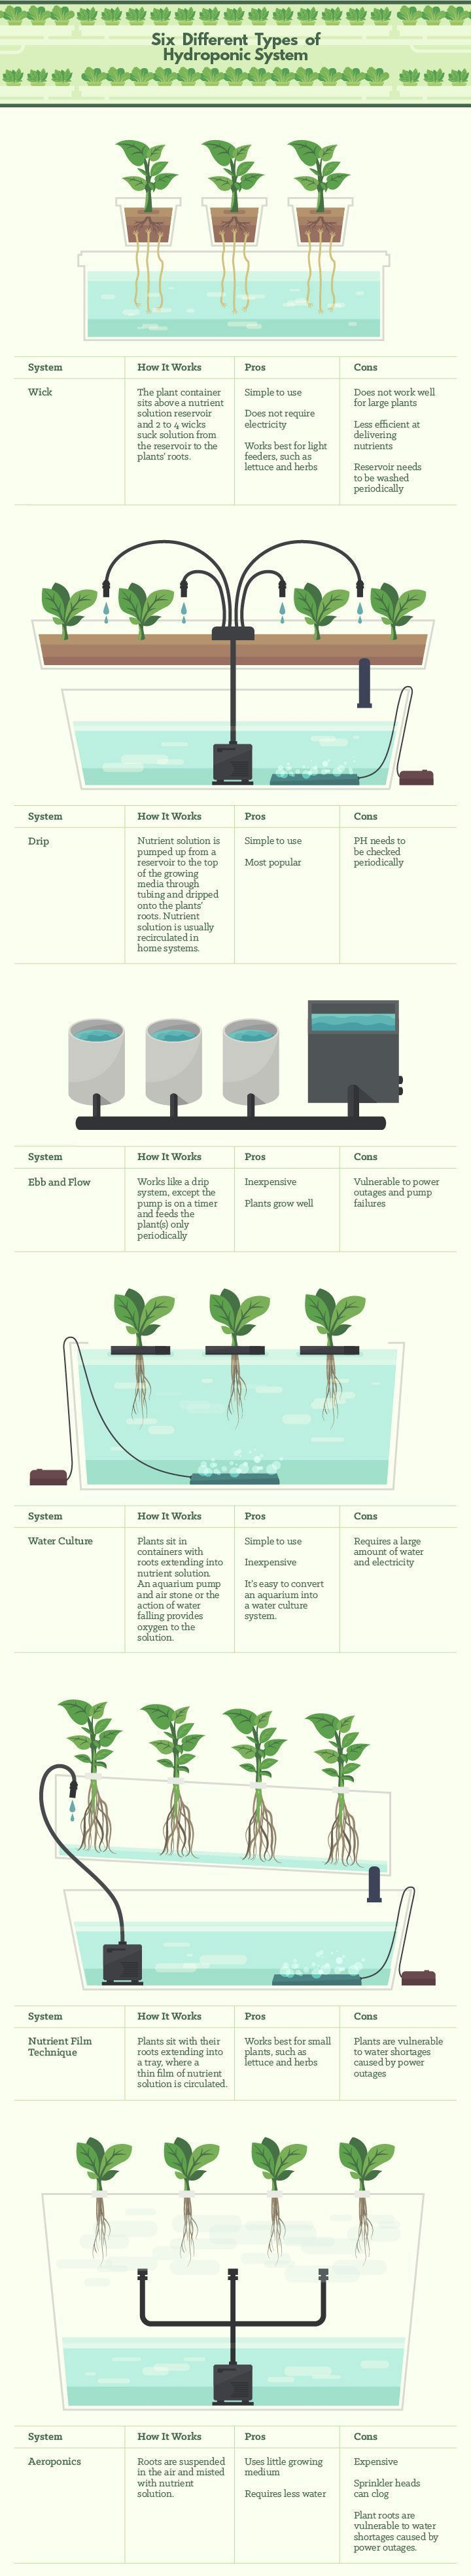 Six Different Types of Hydroponics: